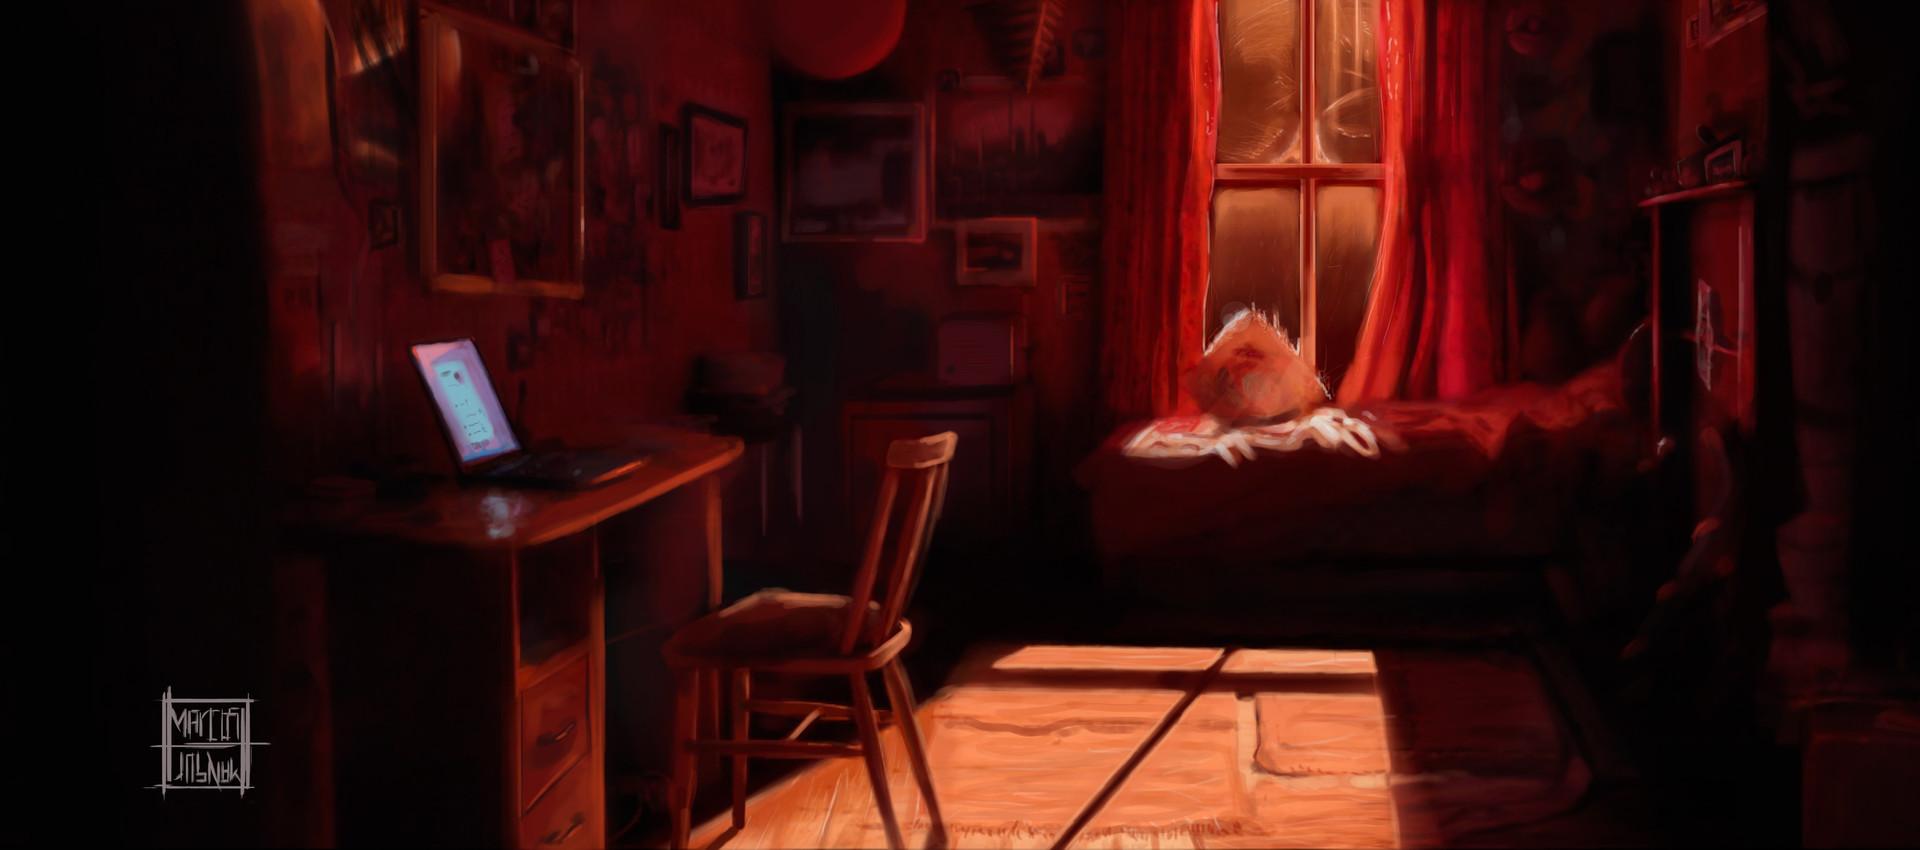 Marcos mansur red room 2